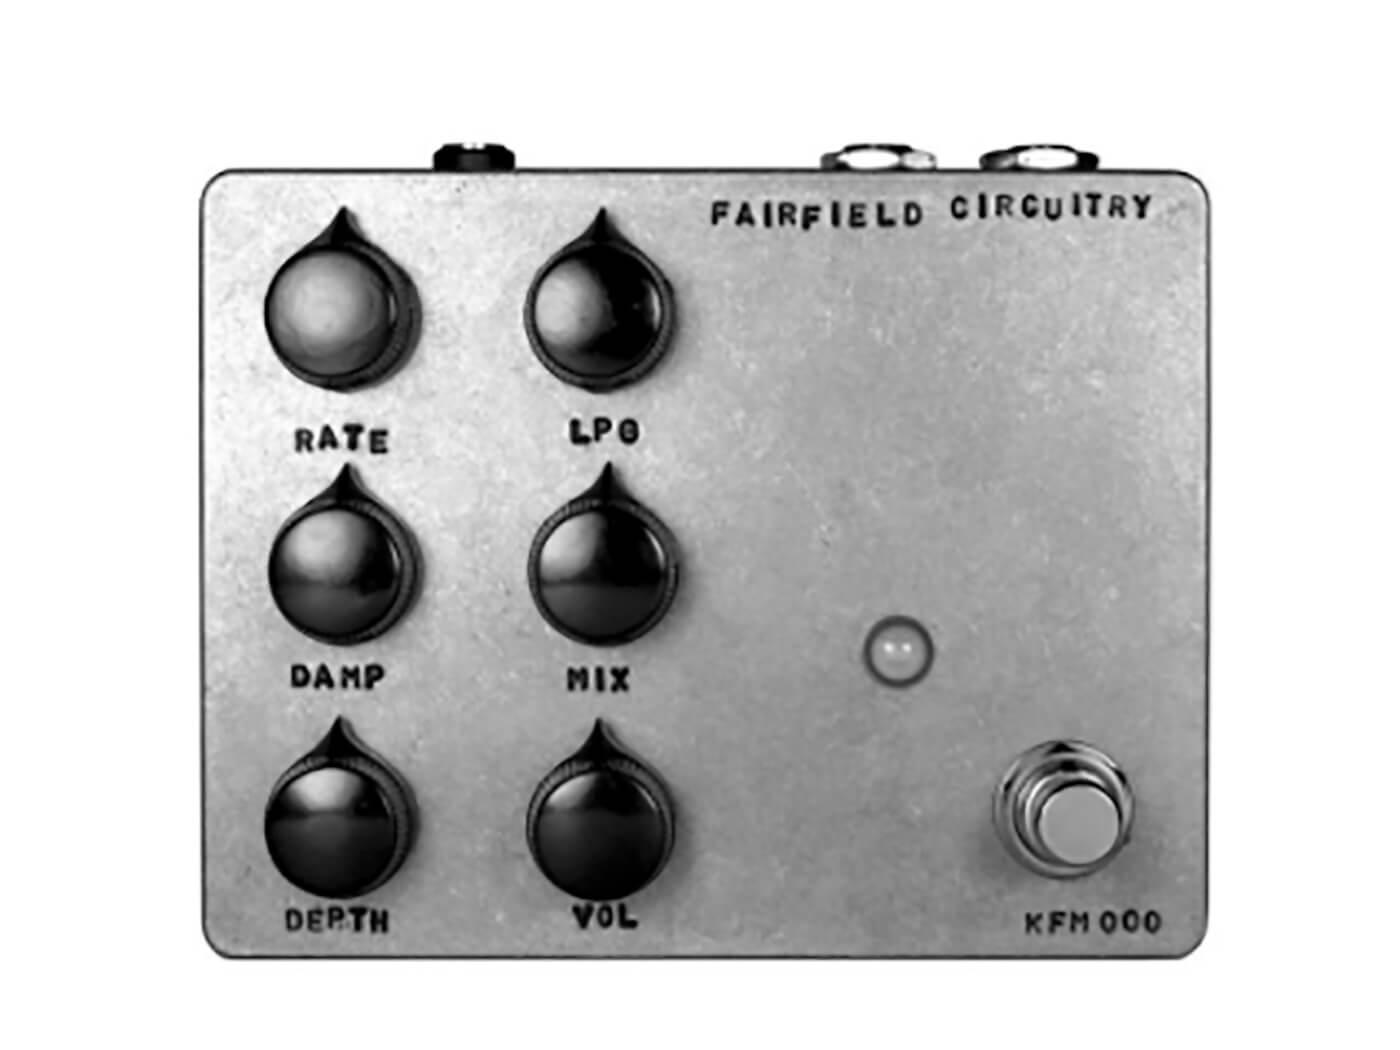 Fairfield Circuitry Shallow Water